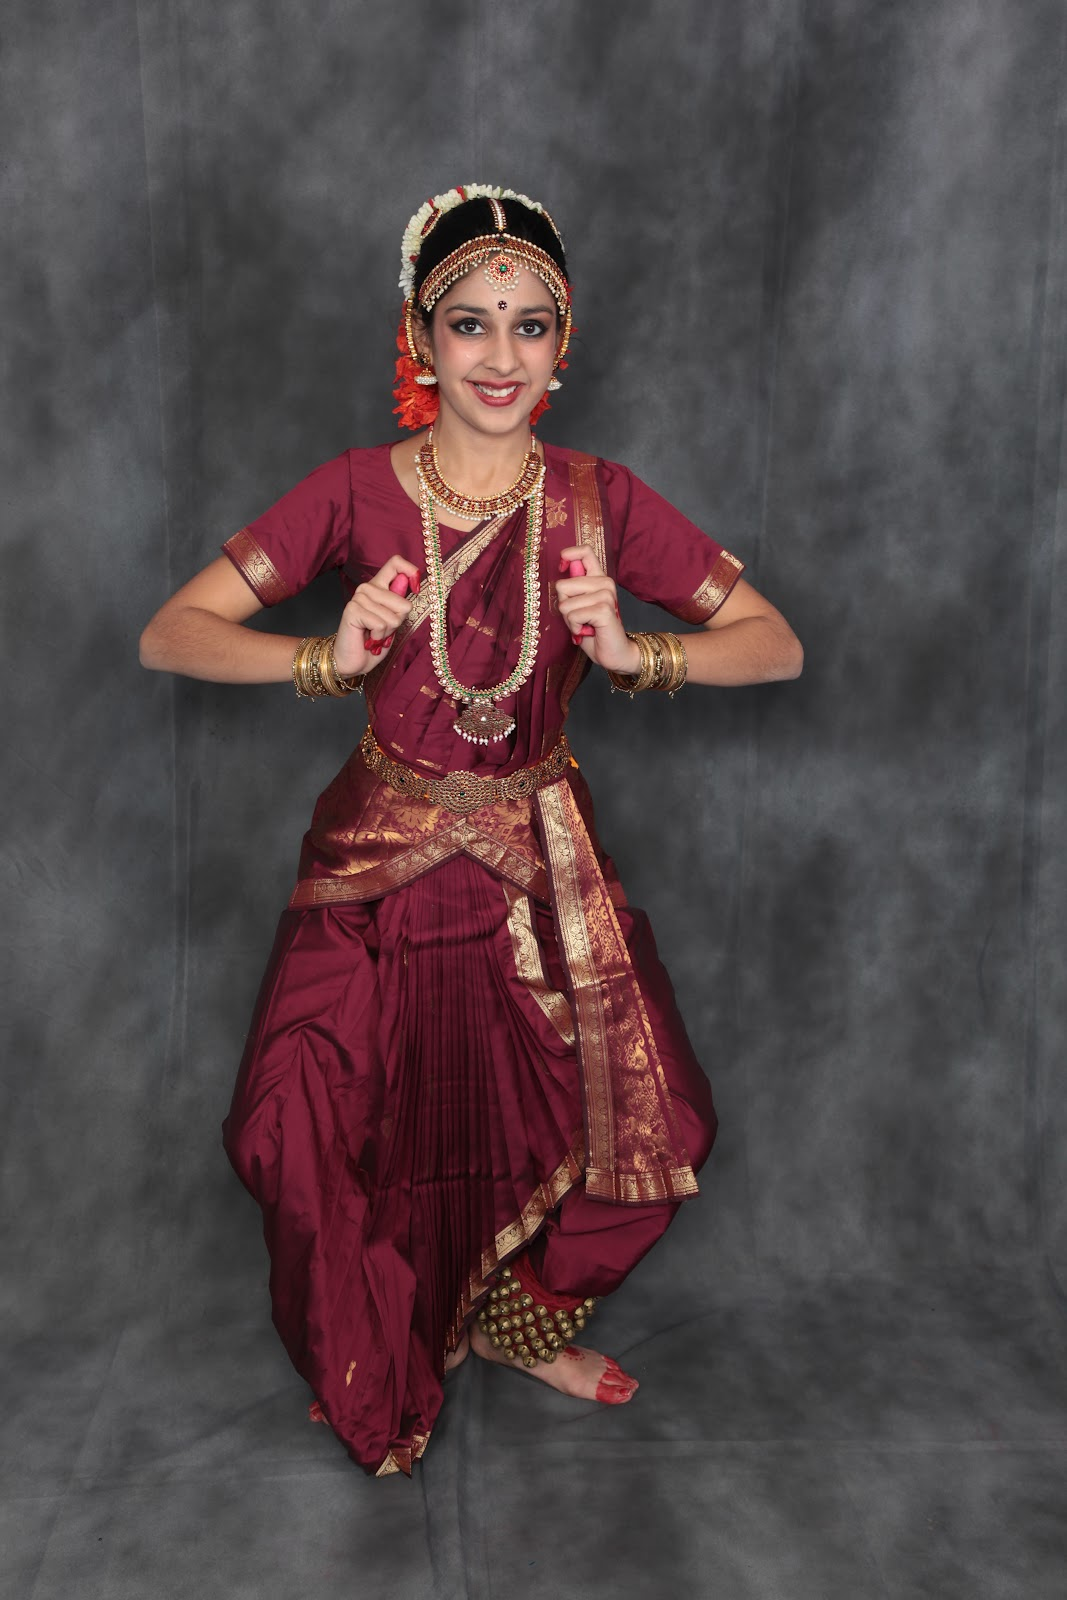 Mahika 39 s arangetram bharatanatyam arangetram for Arangetram stage decoration